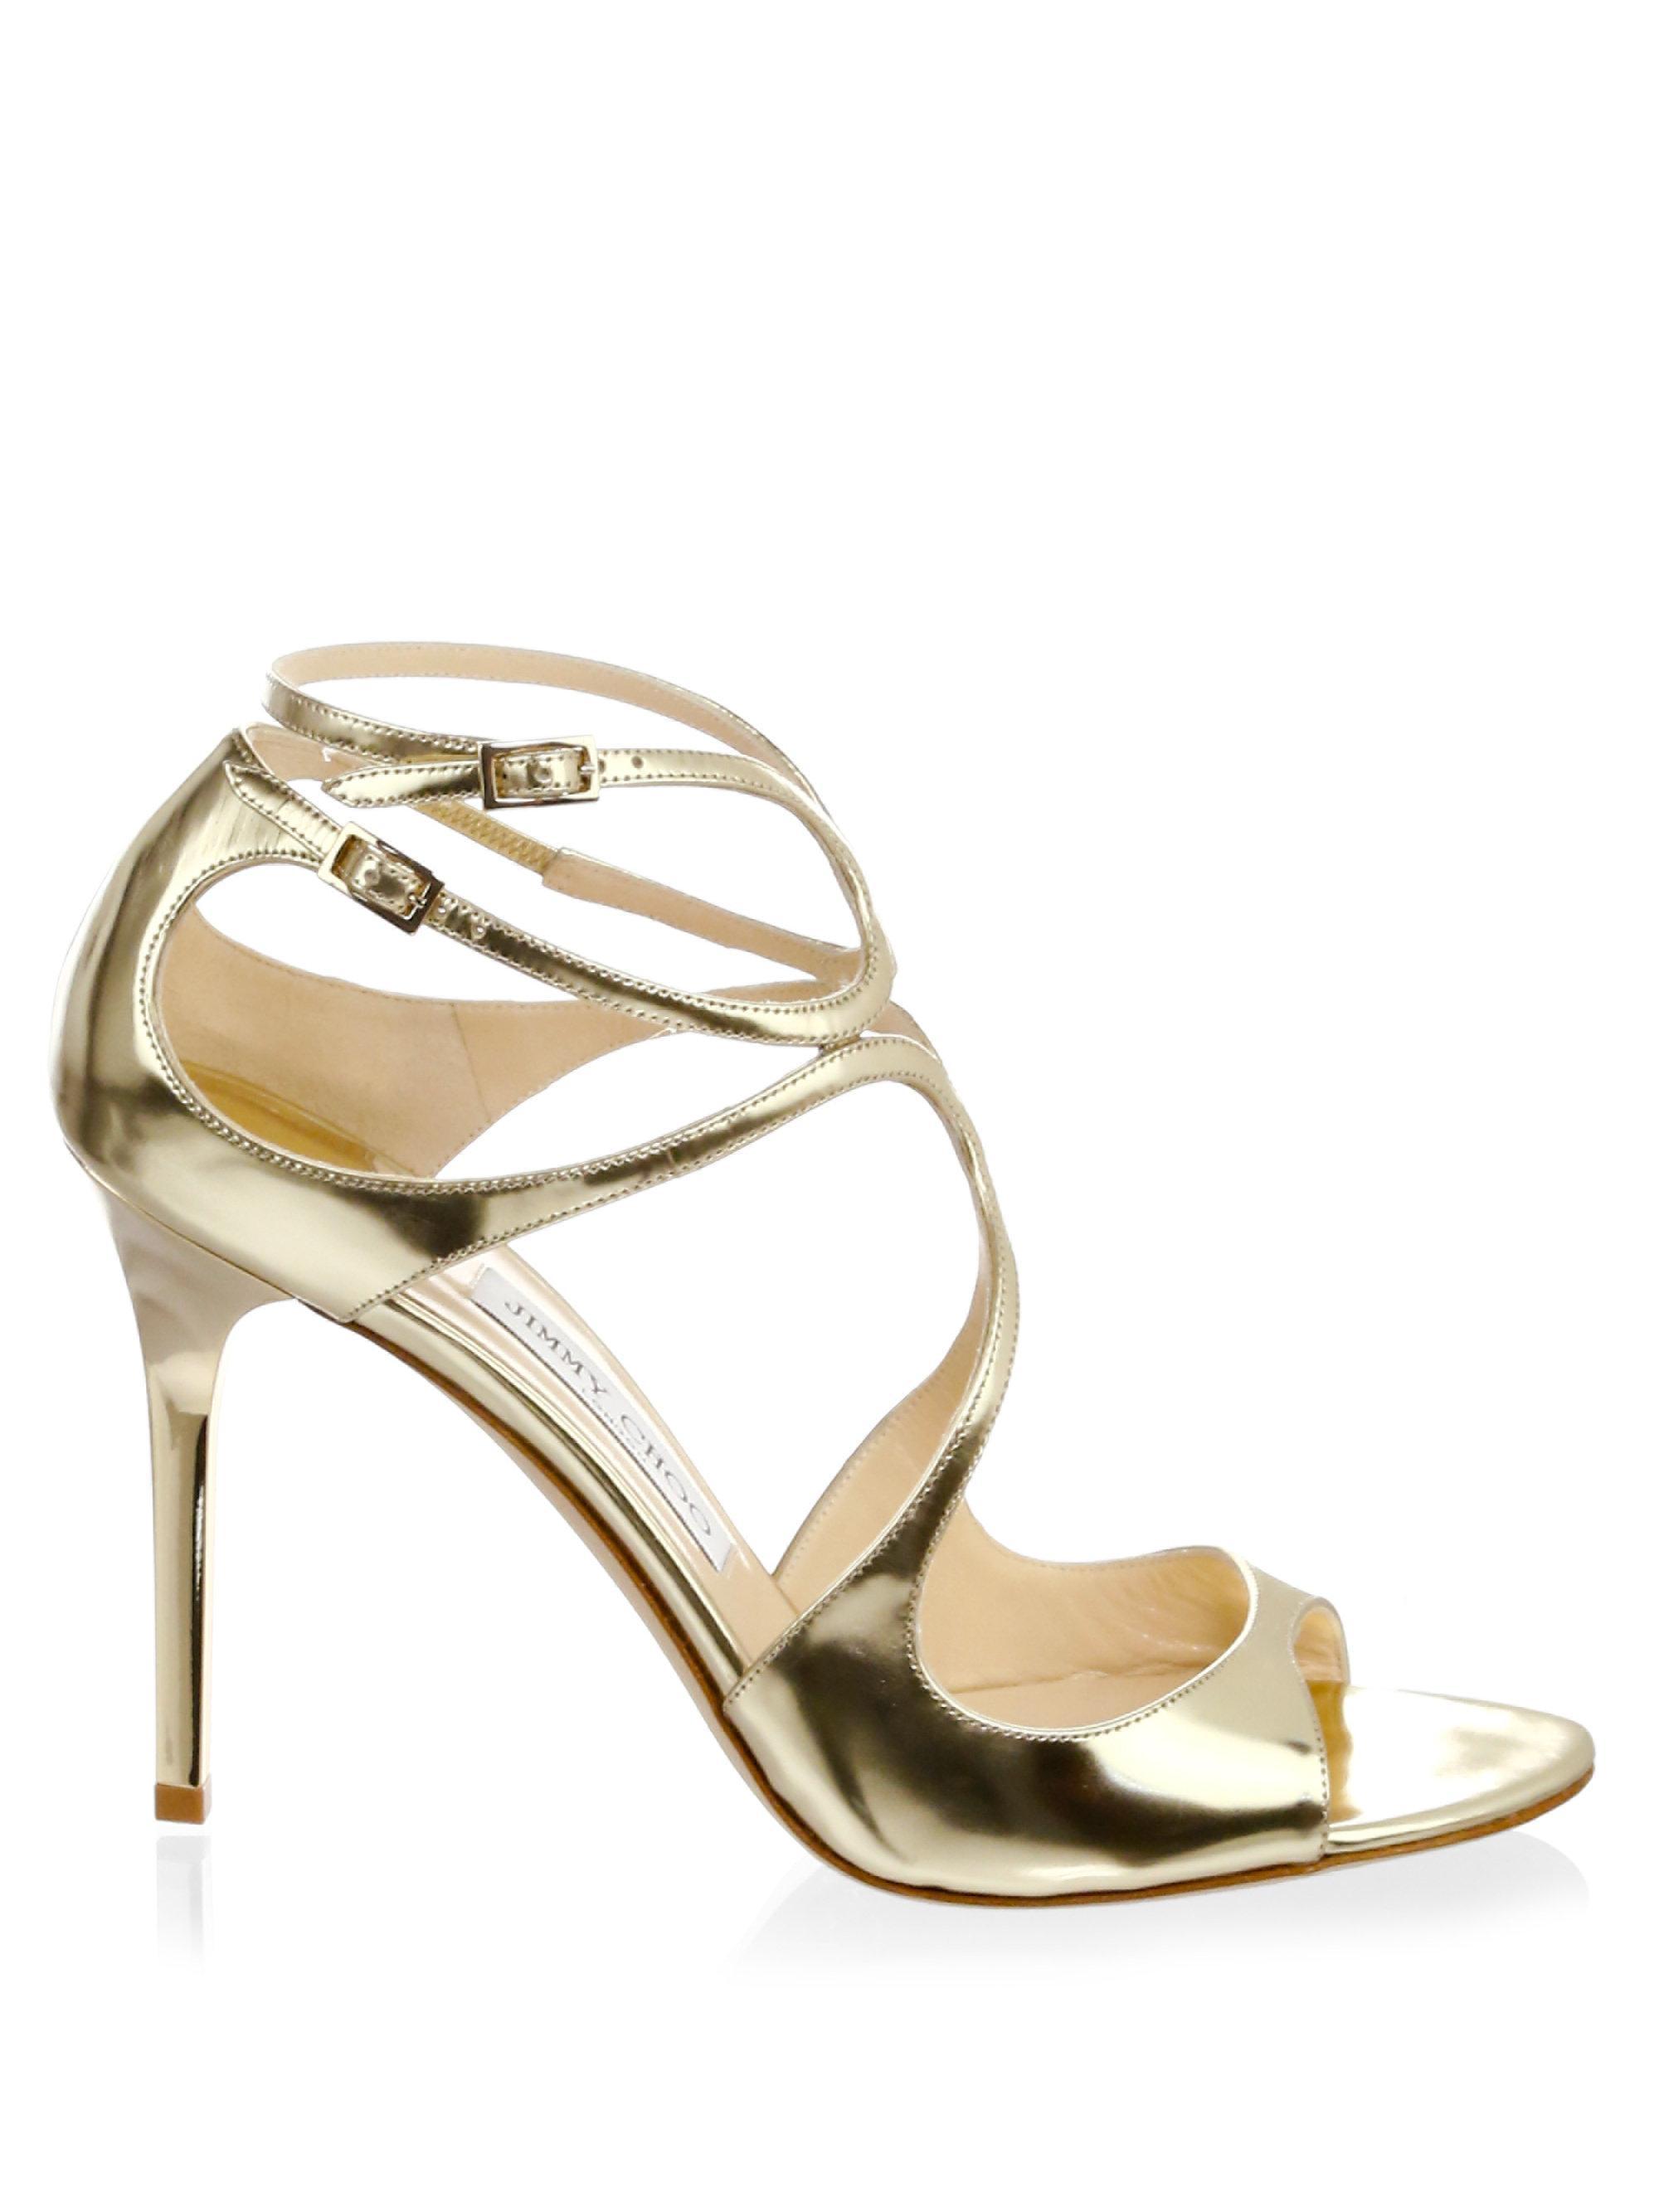 d560a5ad8da Jimmy Choo Pat Strappy Sandals in Metallic - Lyst